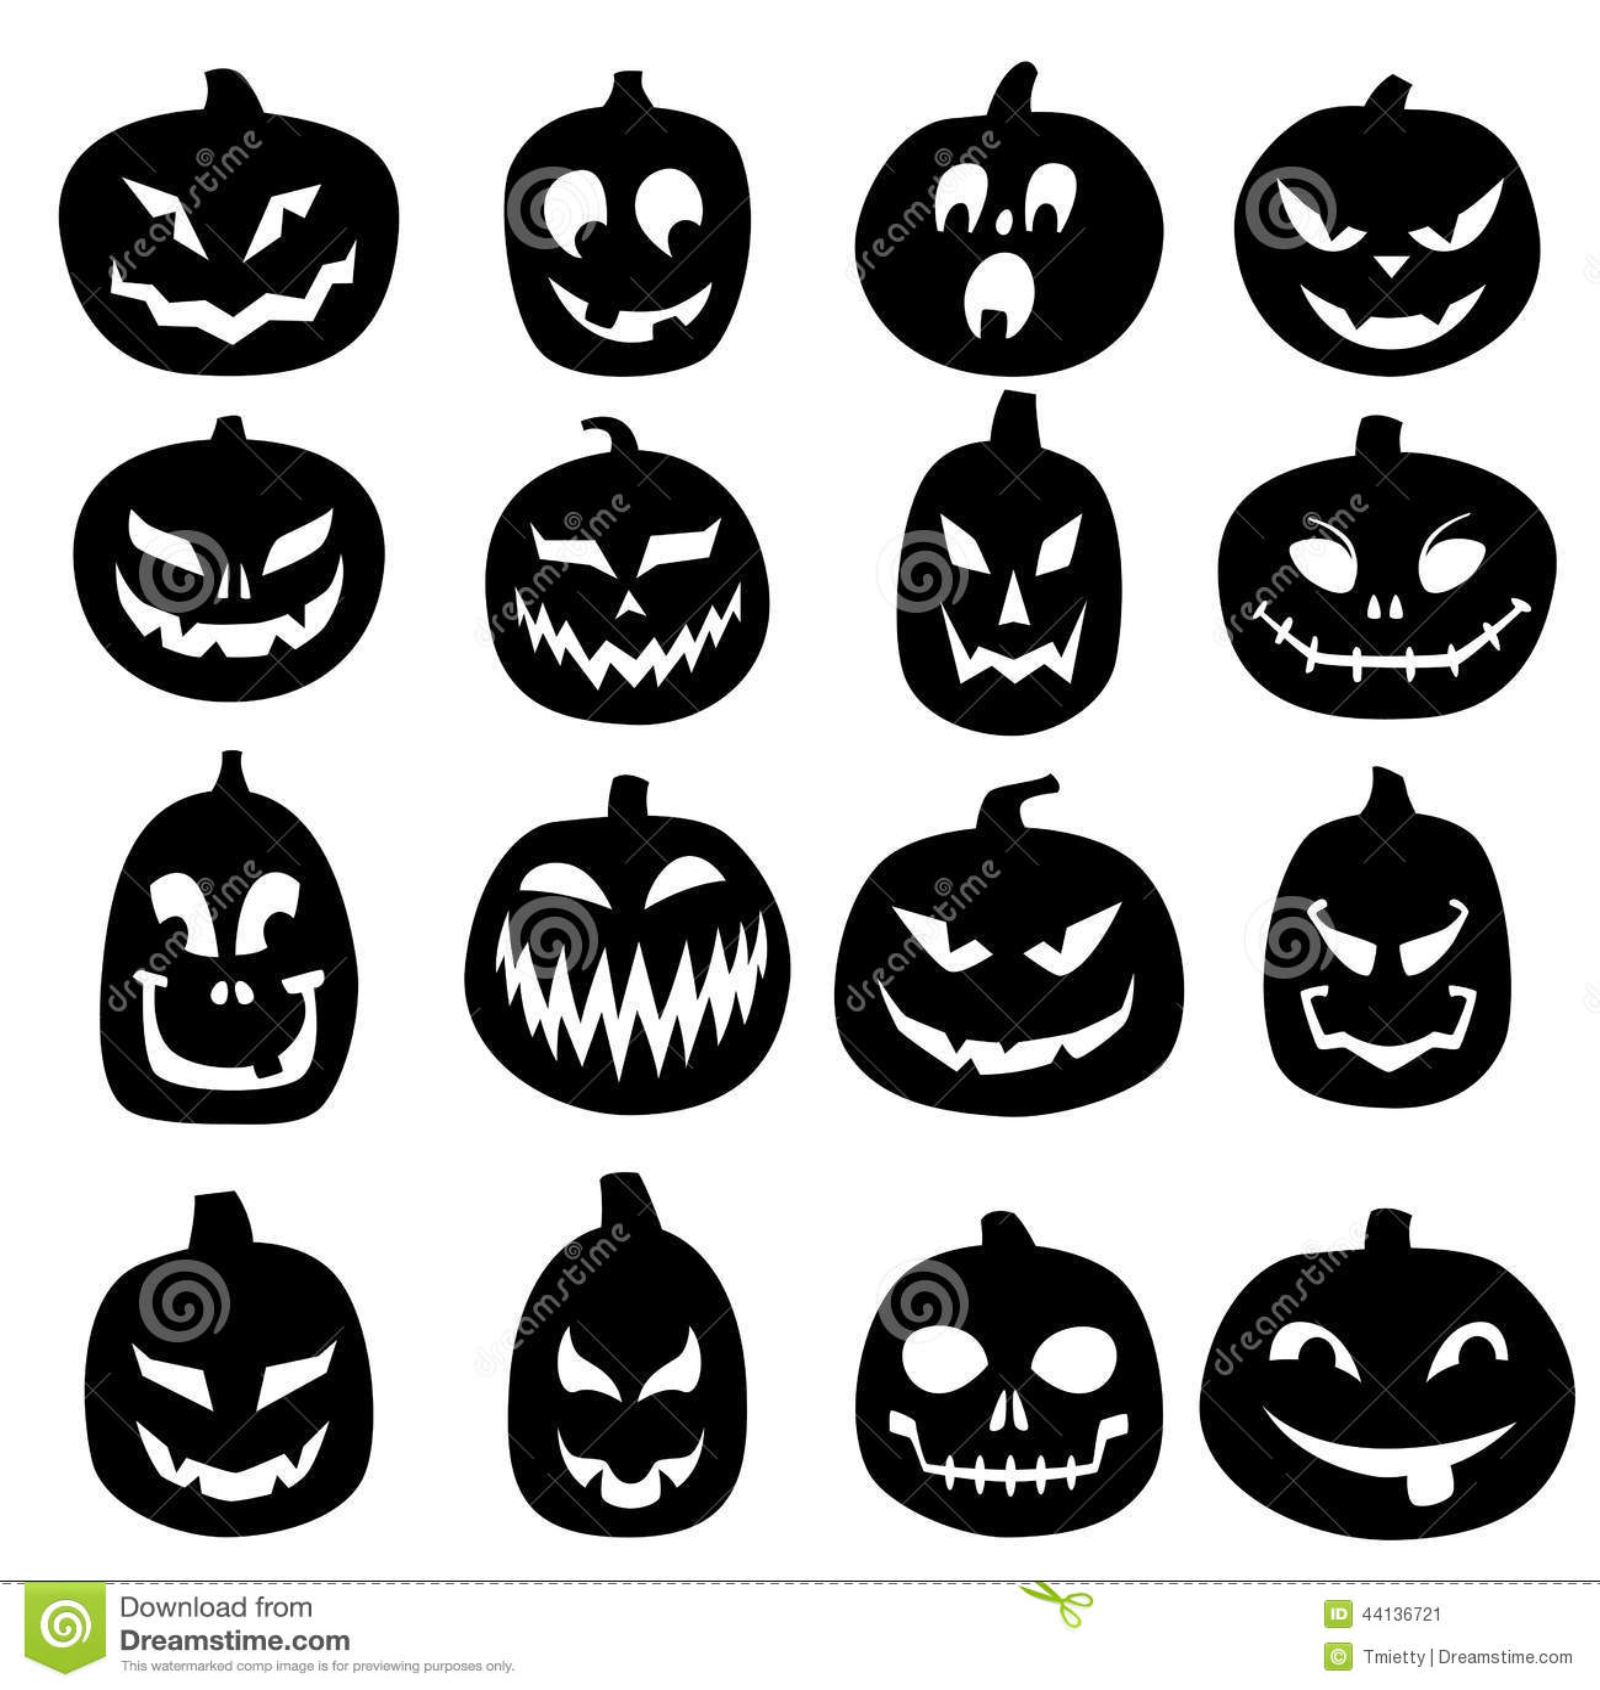 Jack o lantern carved pumpkin icons stock vector image